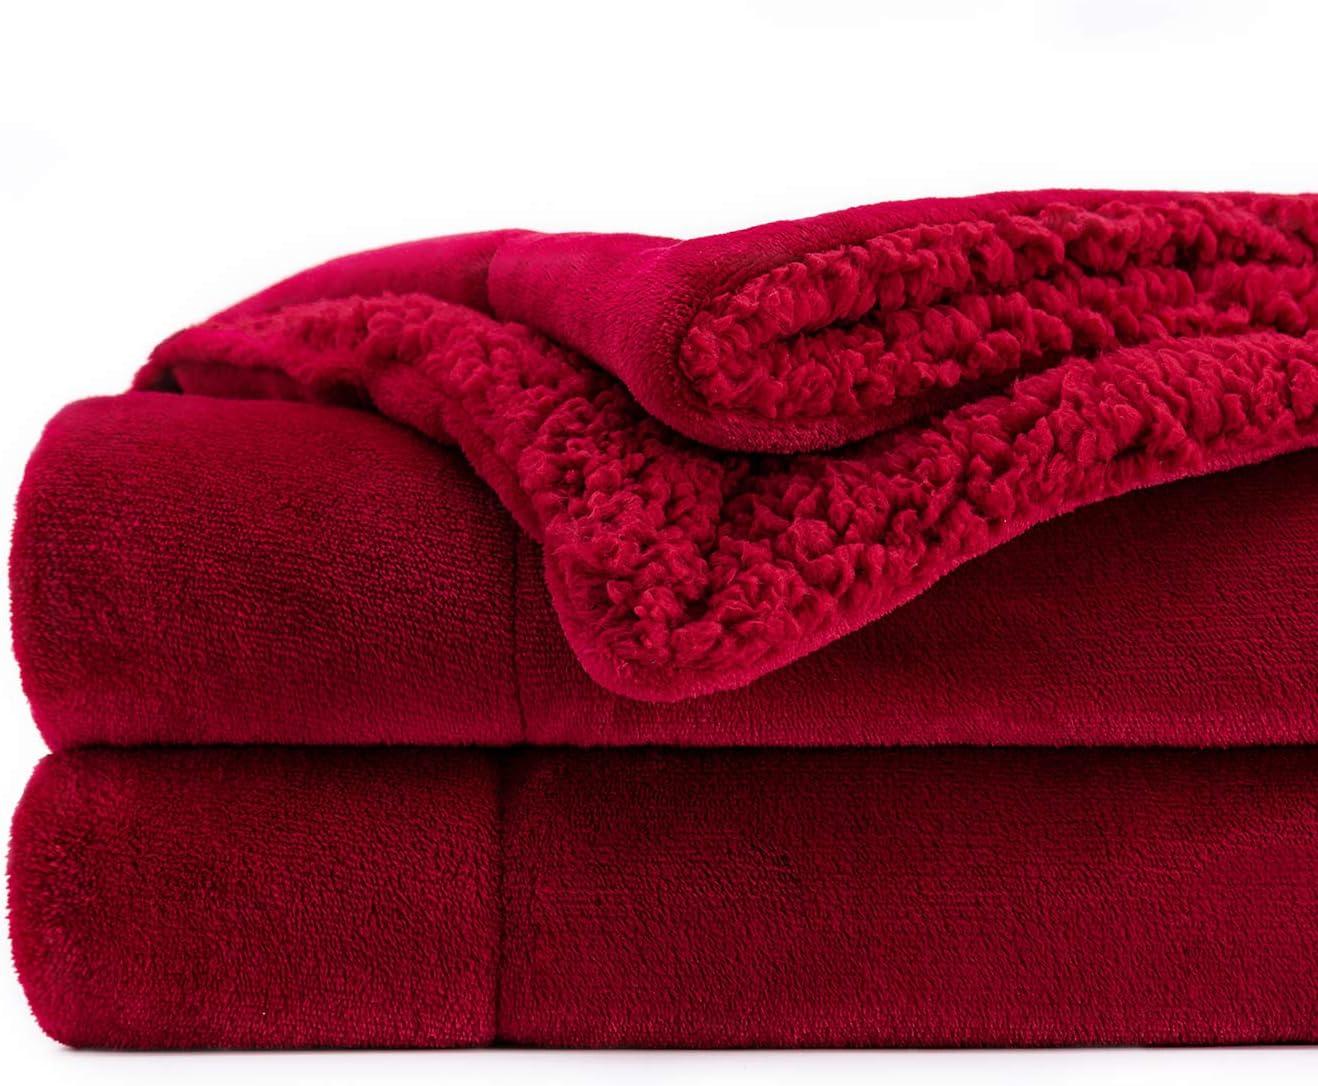 Topblan Sherpa Los Angeles Sales Mall Fleece Throw Blanket Reversible Ultra Soft Plush